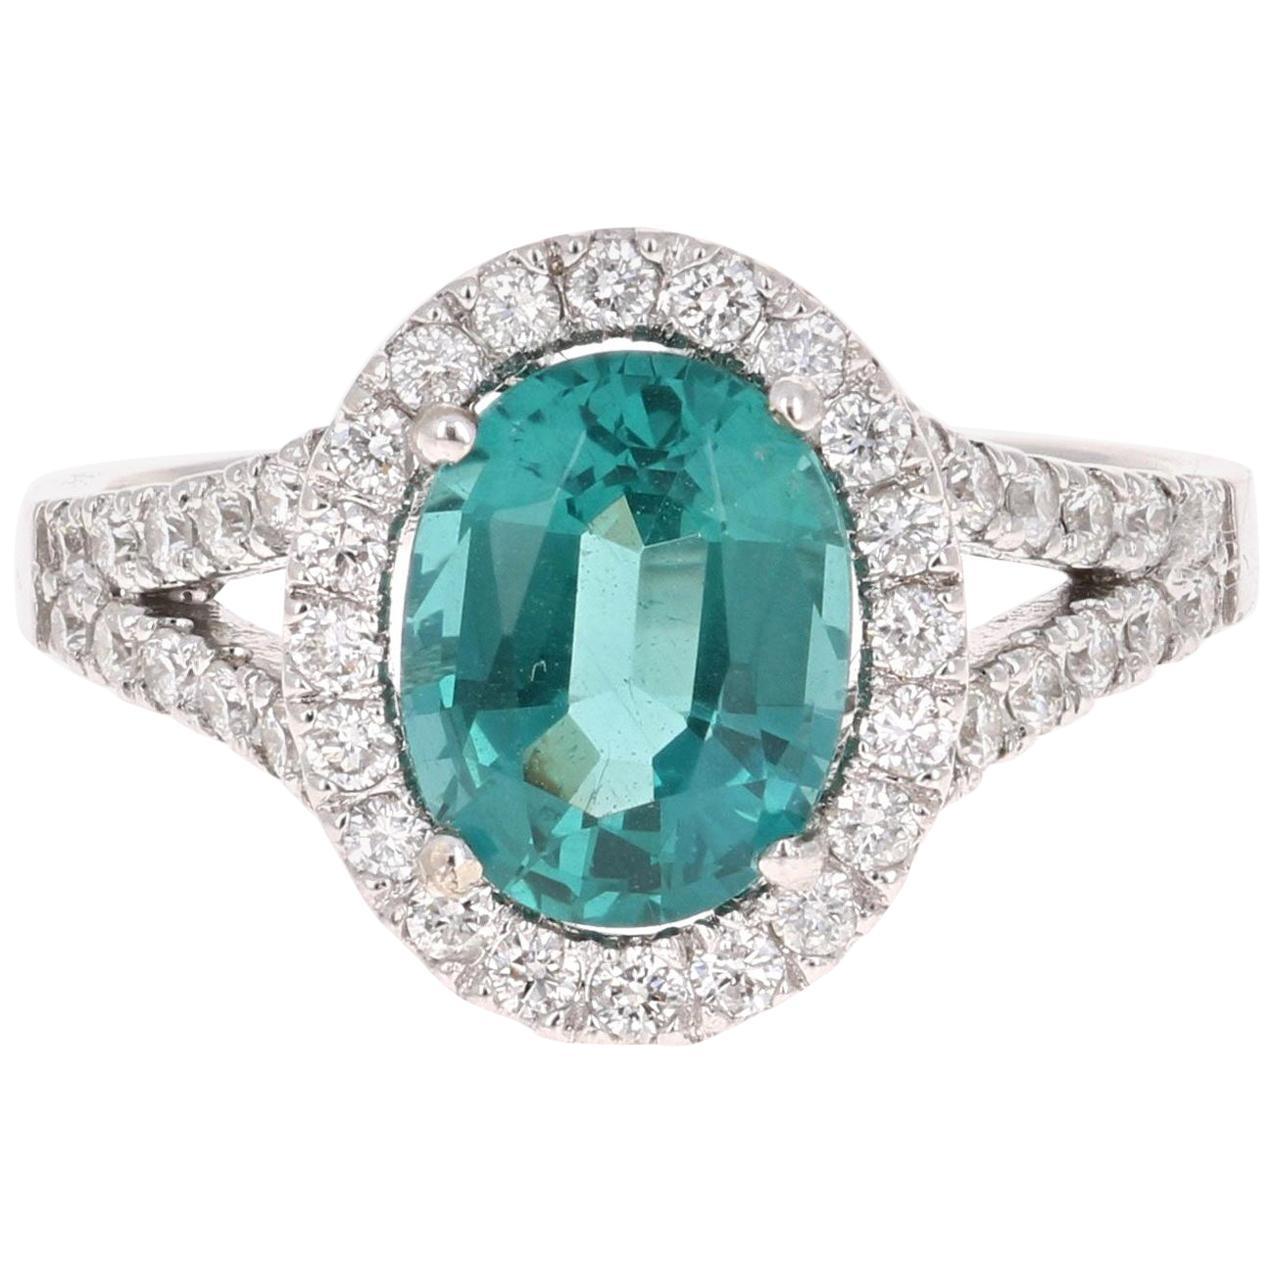 2.62 Carat Apatite Halo Diamond Engagement Ring